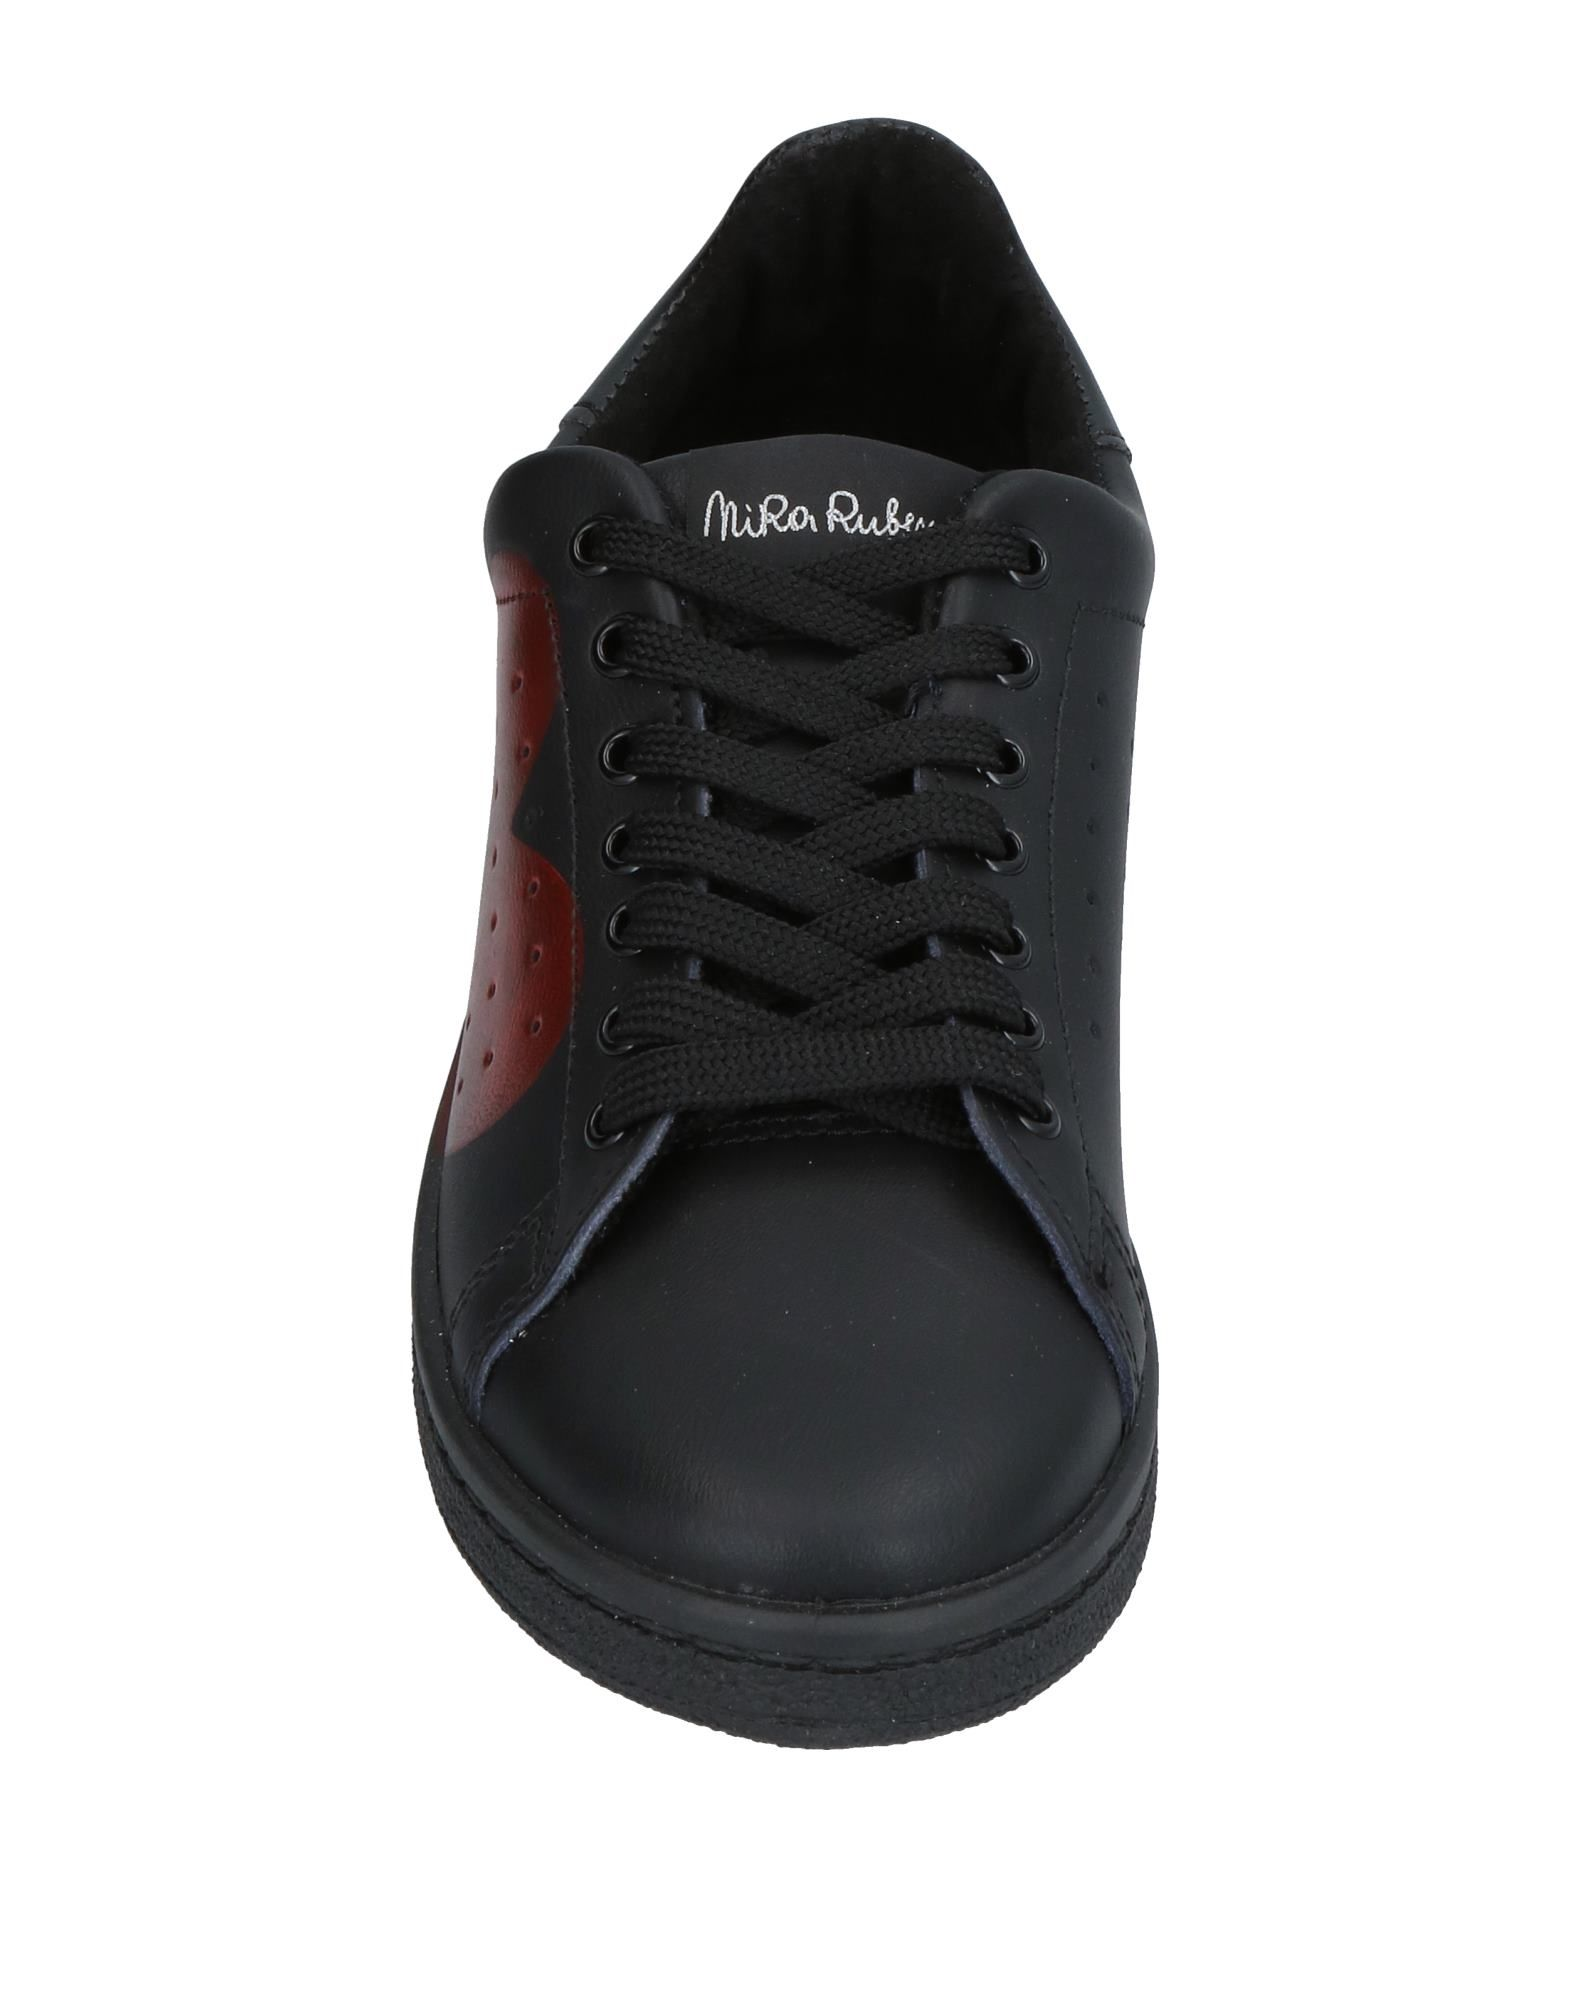 Sneakers Nira Rubens Donna Donna Rubens - 11370422LM ab87b1